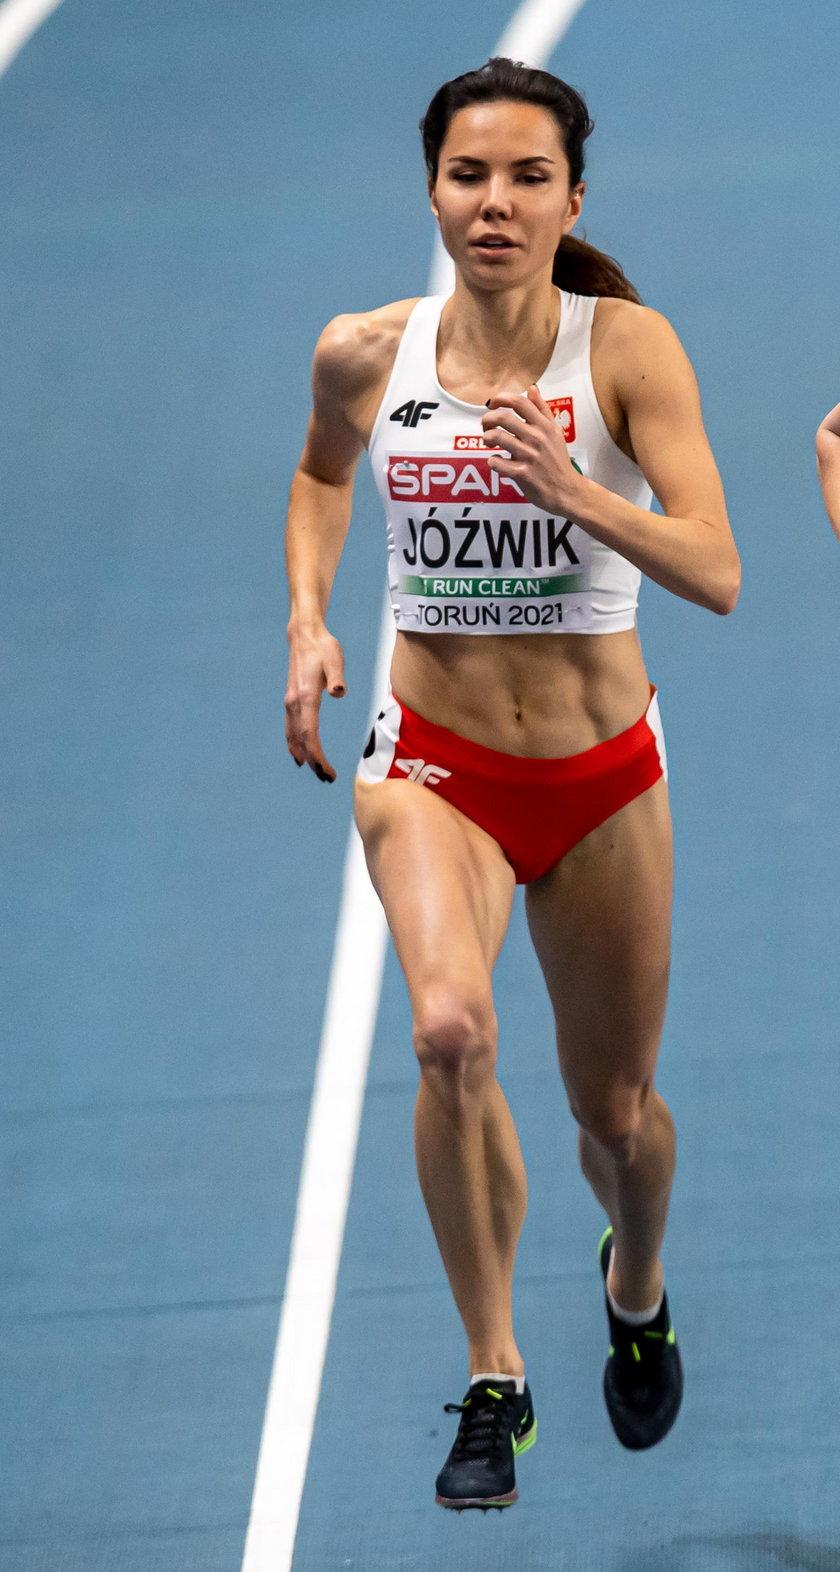 Halowe Mistrzostwa Europy w Lekkoatletyce 2021